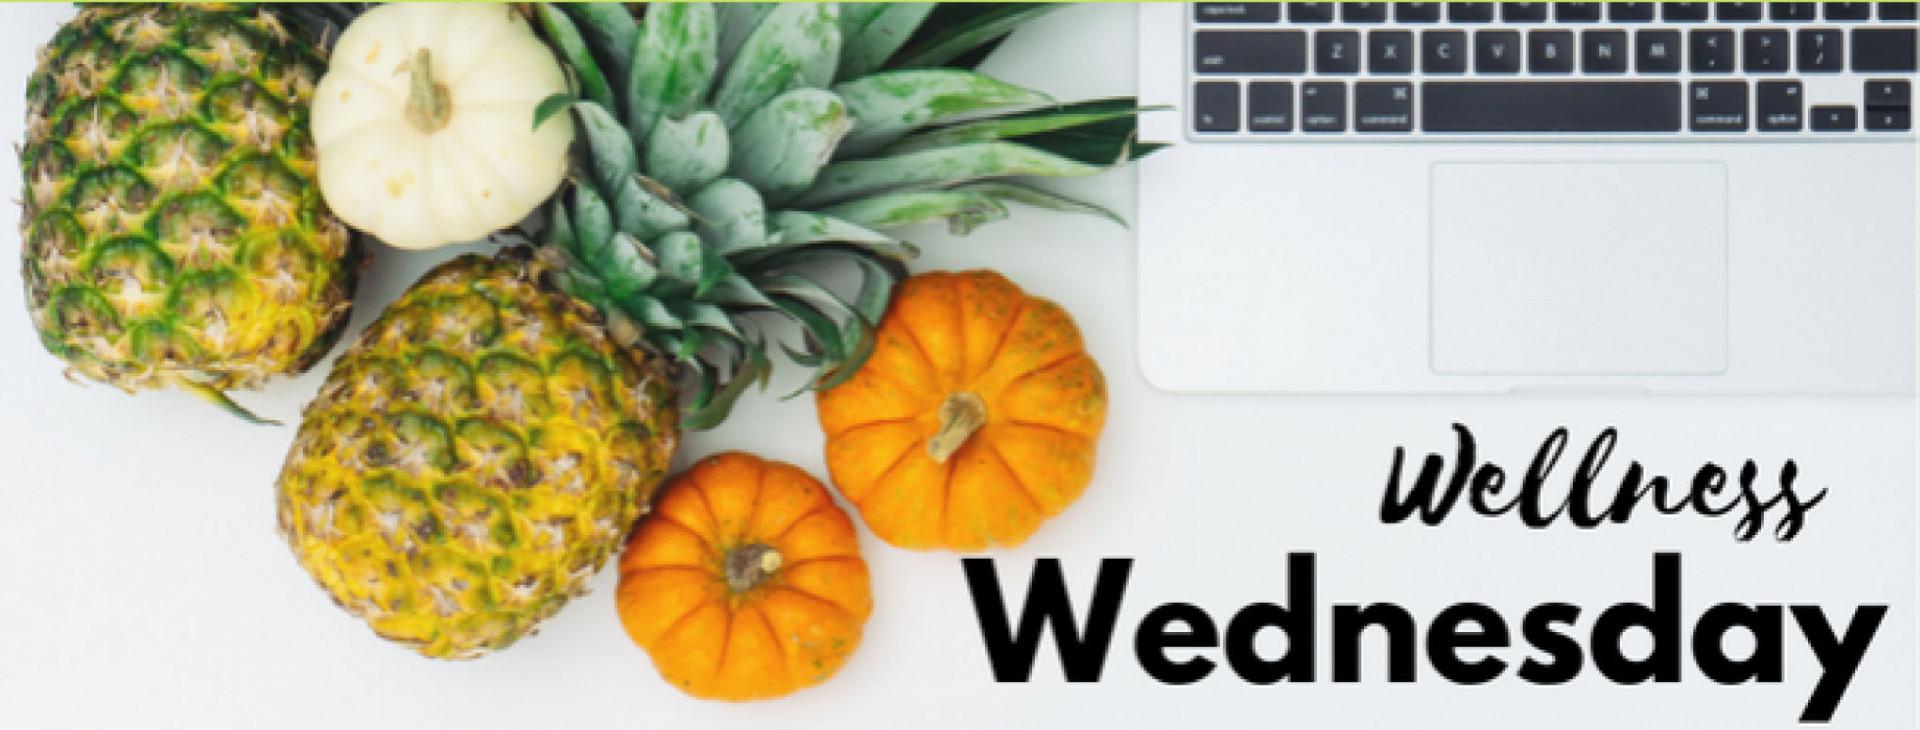 Wellness Wednesday - October 16th, 2019